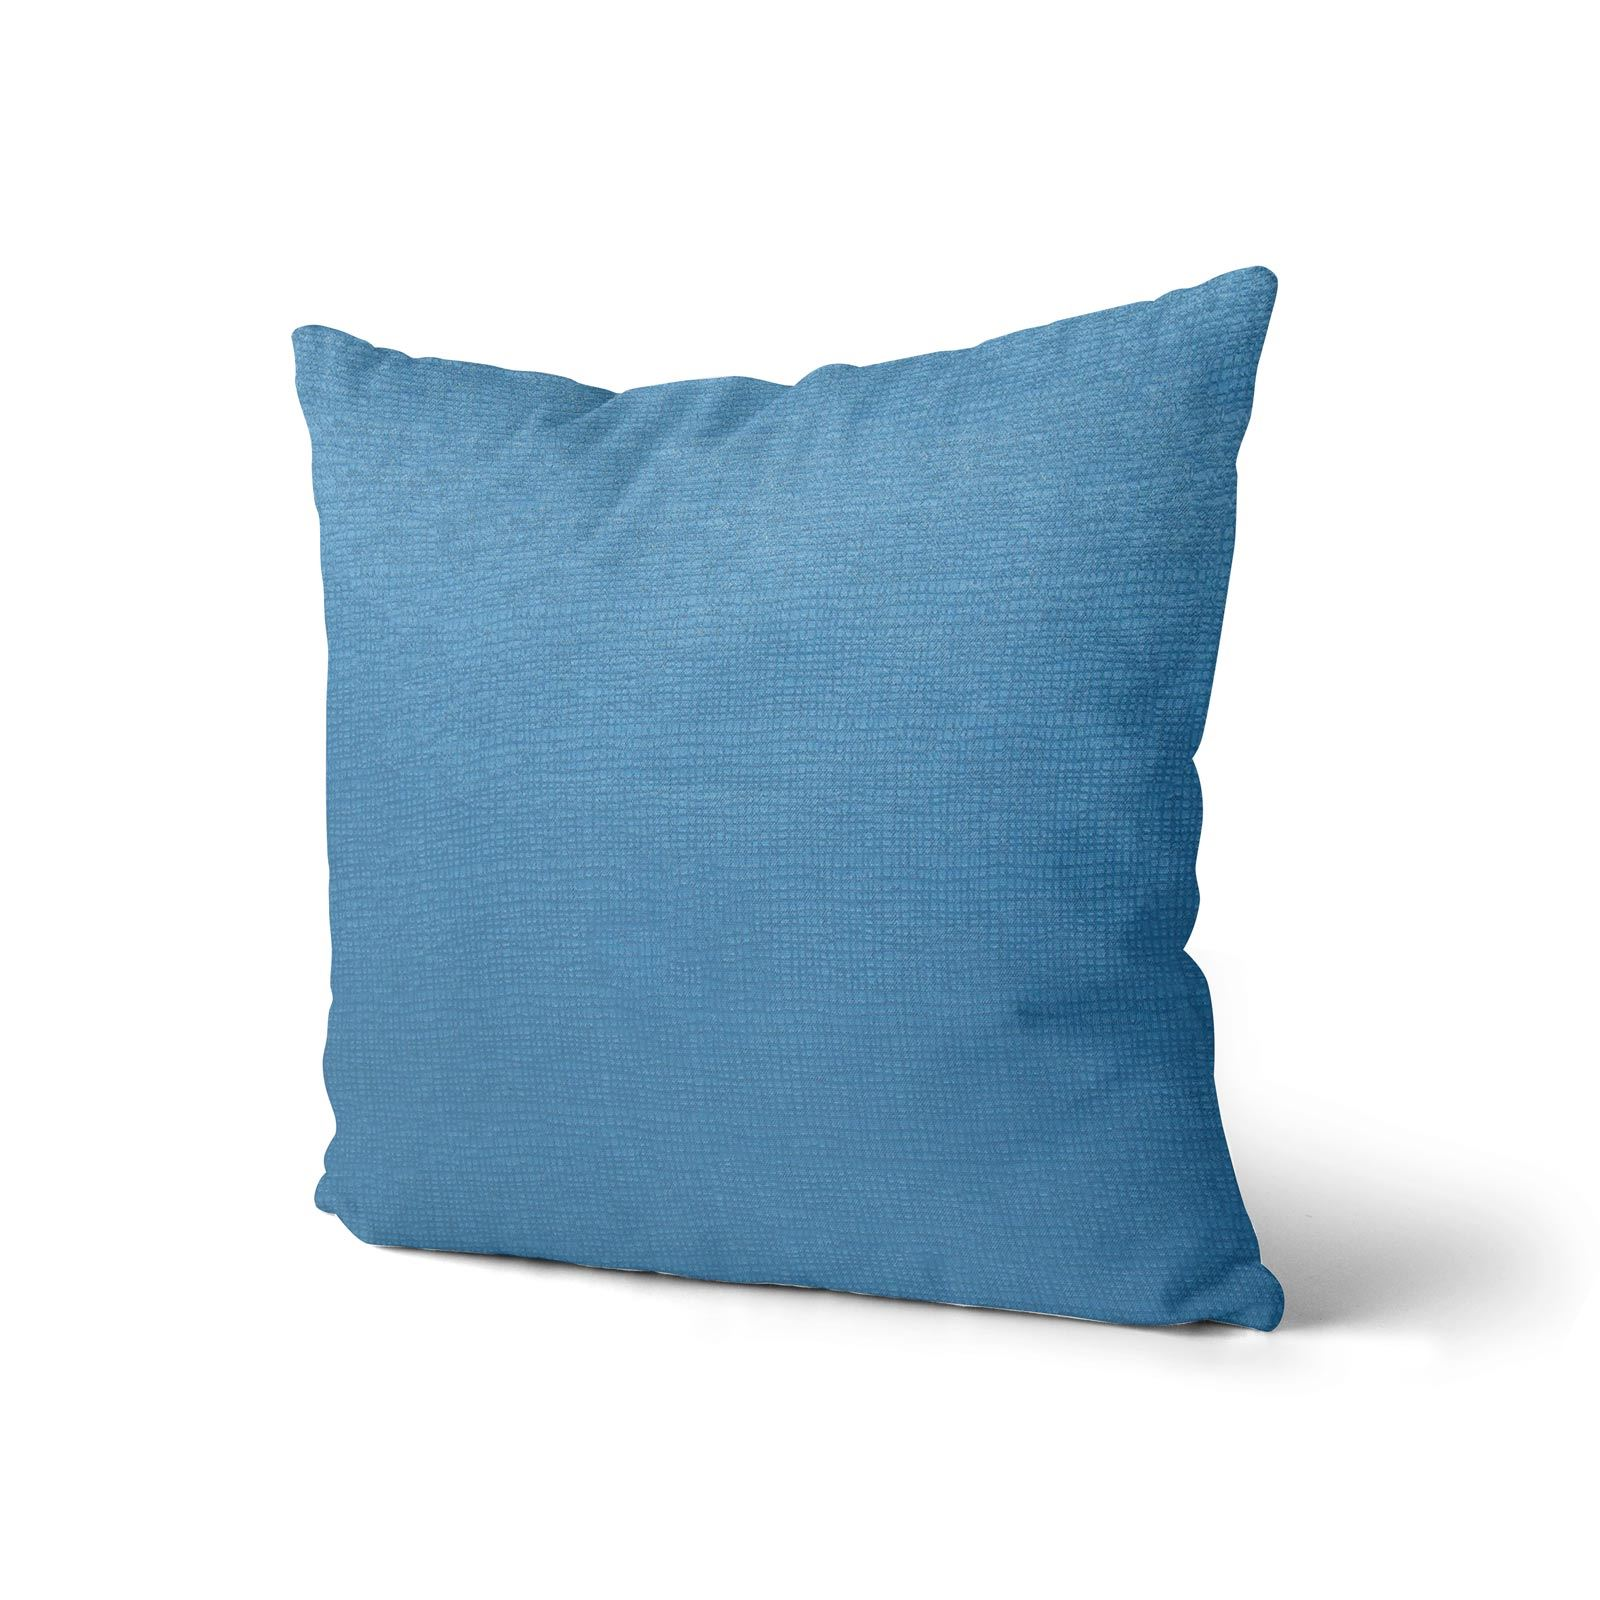 Teal-Blue-Duck-Egg-Cushion-Covers-18-034-x18-034-45cm-x-45cm-Luxury-Cover thumbnail 17